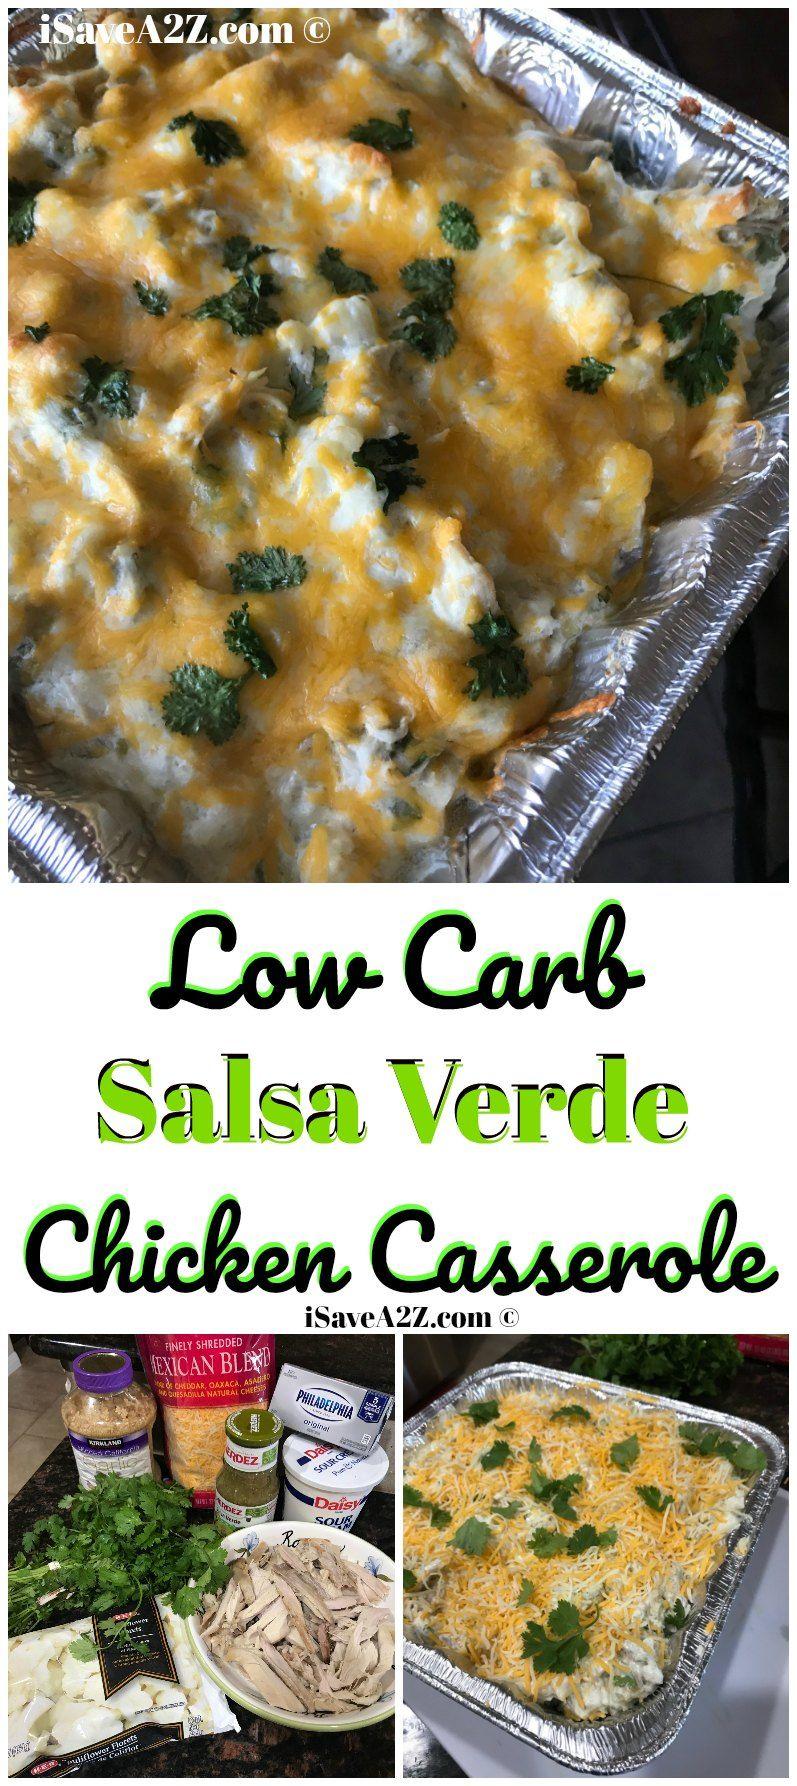 Low Carb Salsa Verde Chicken Casserole Recipe Recipe Chicken Recipes Casserole Ketogenic Recipes Low Carb Casseroles